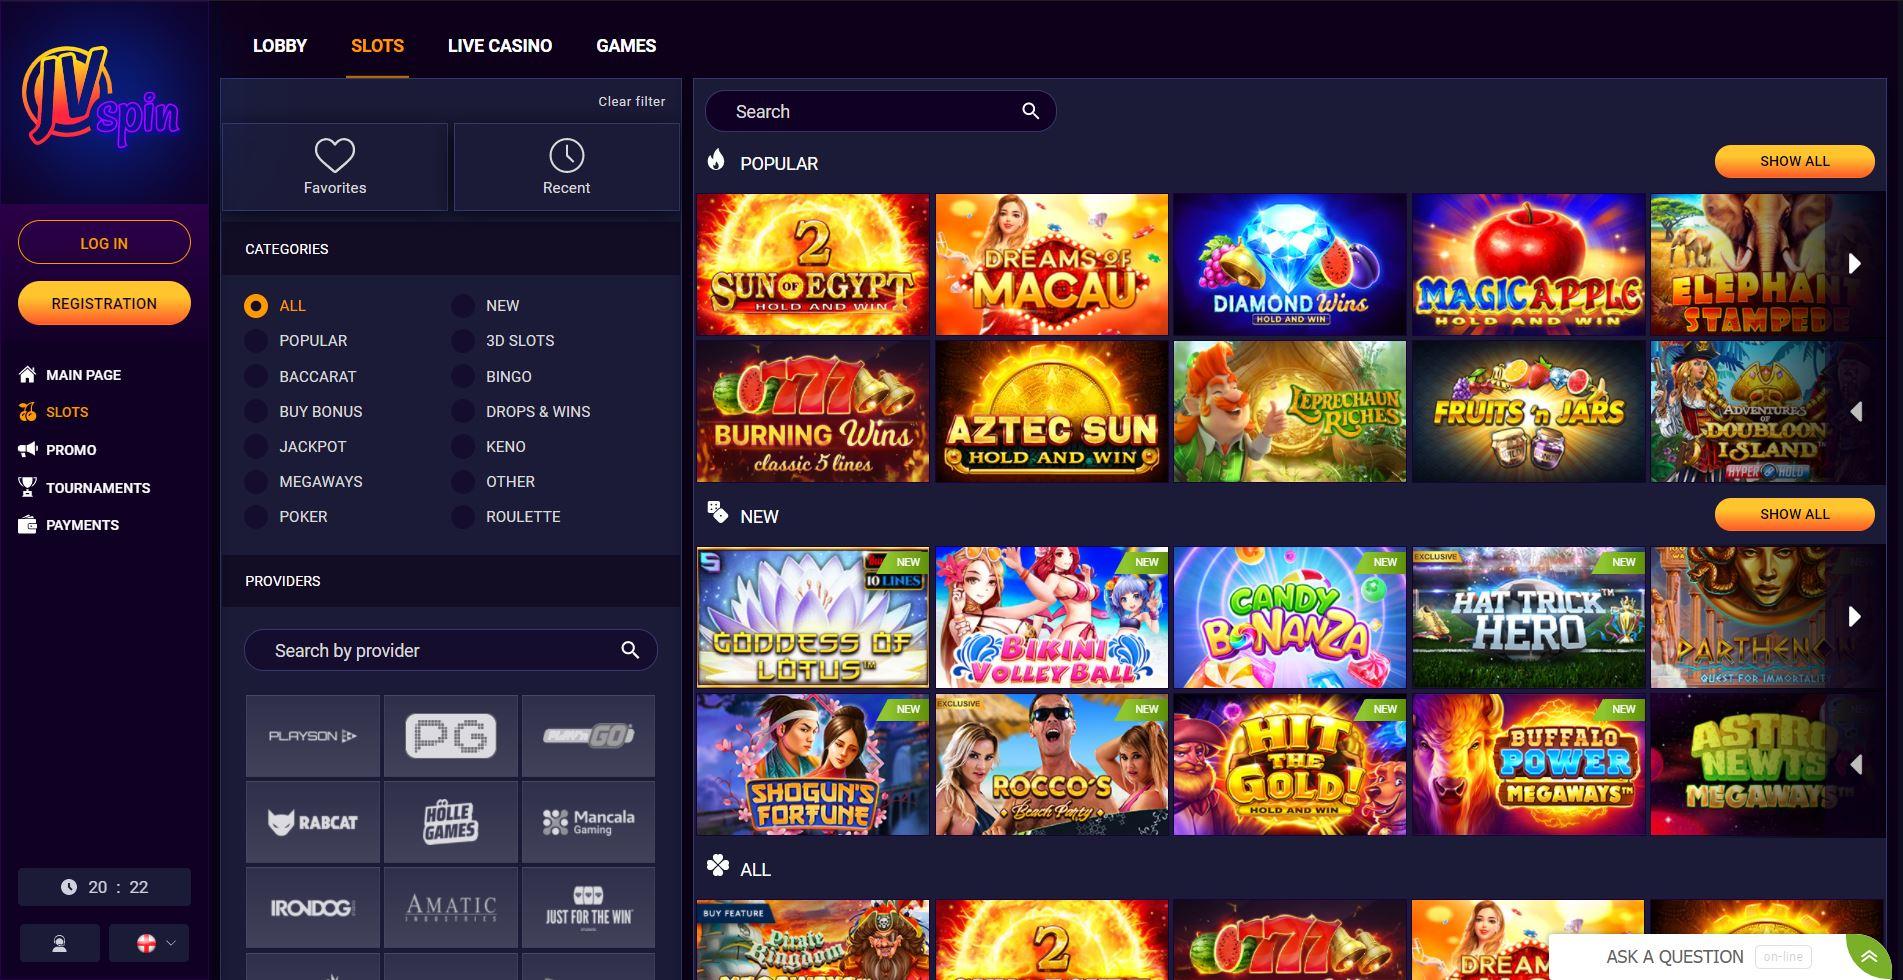 JV Spin Casino india